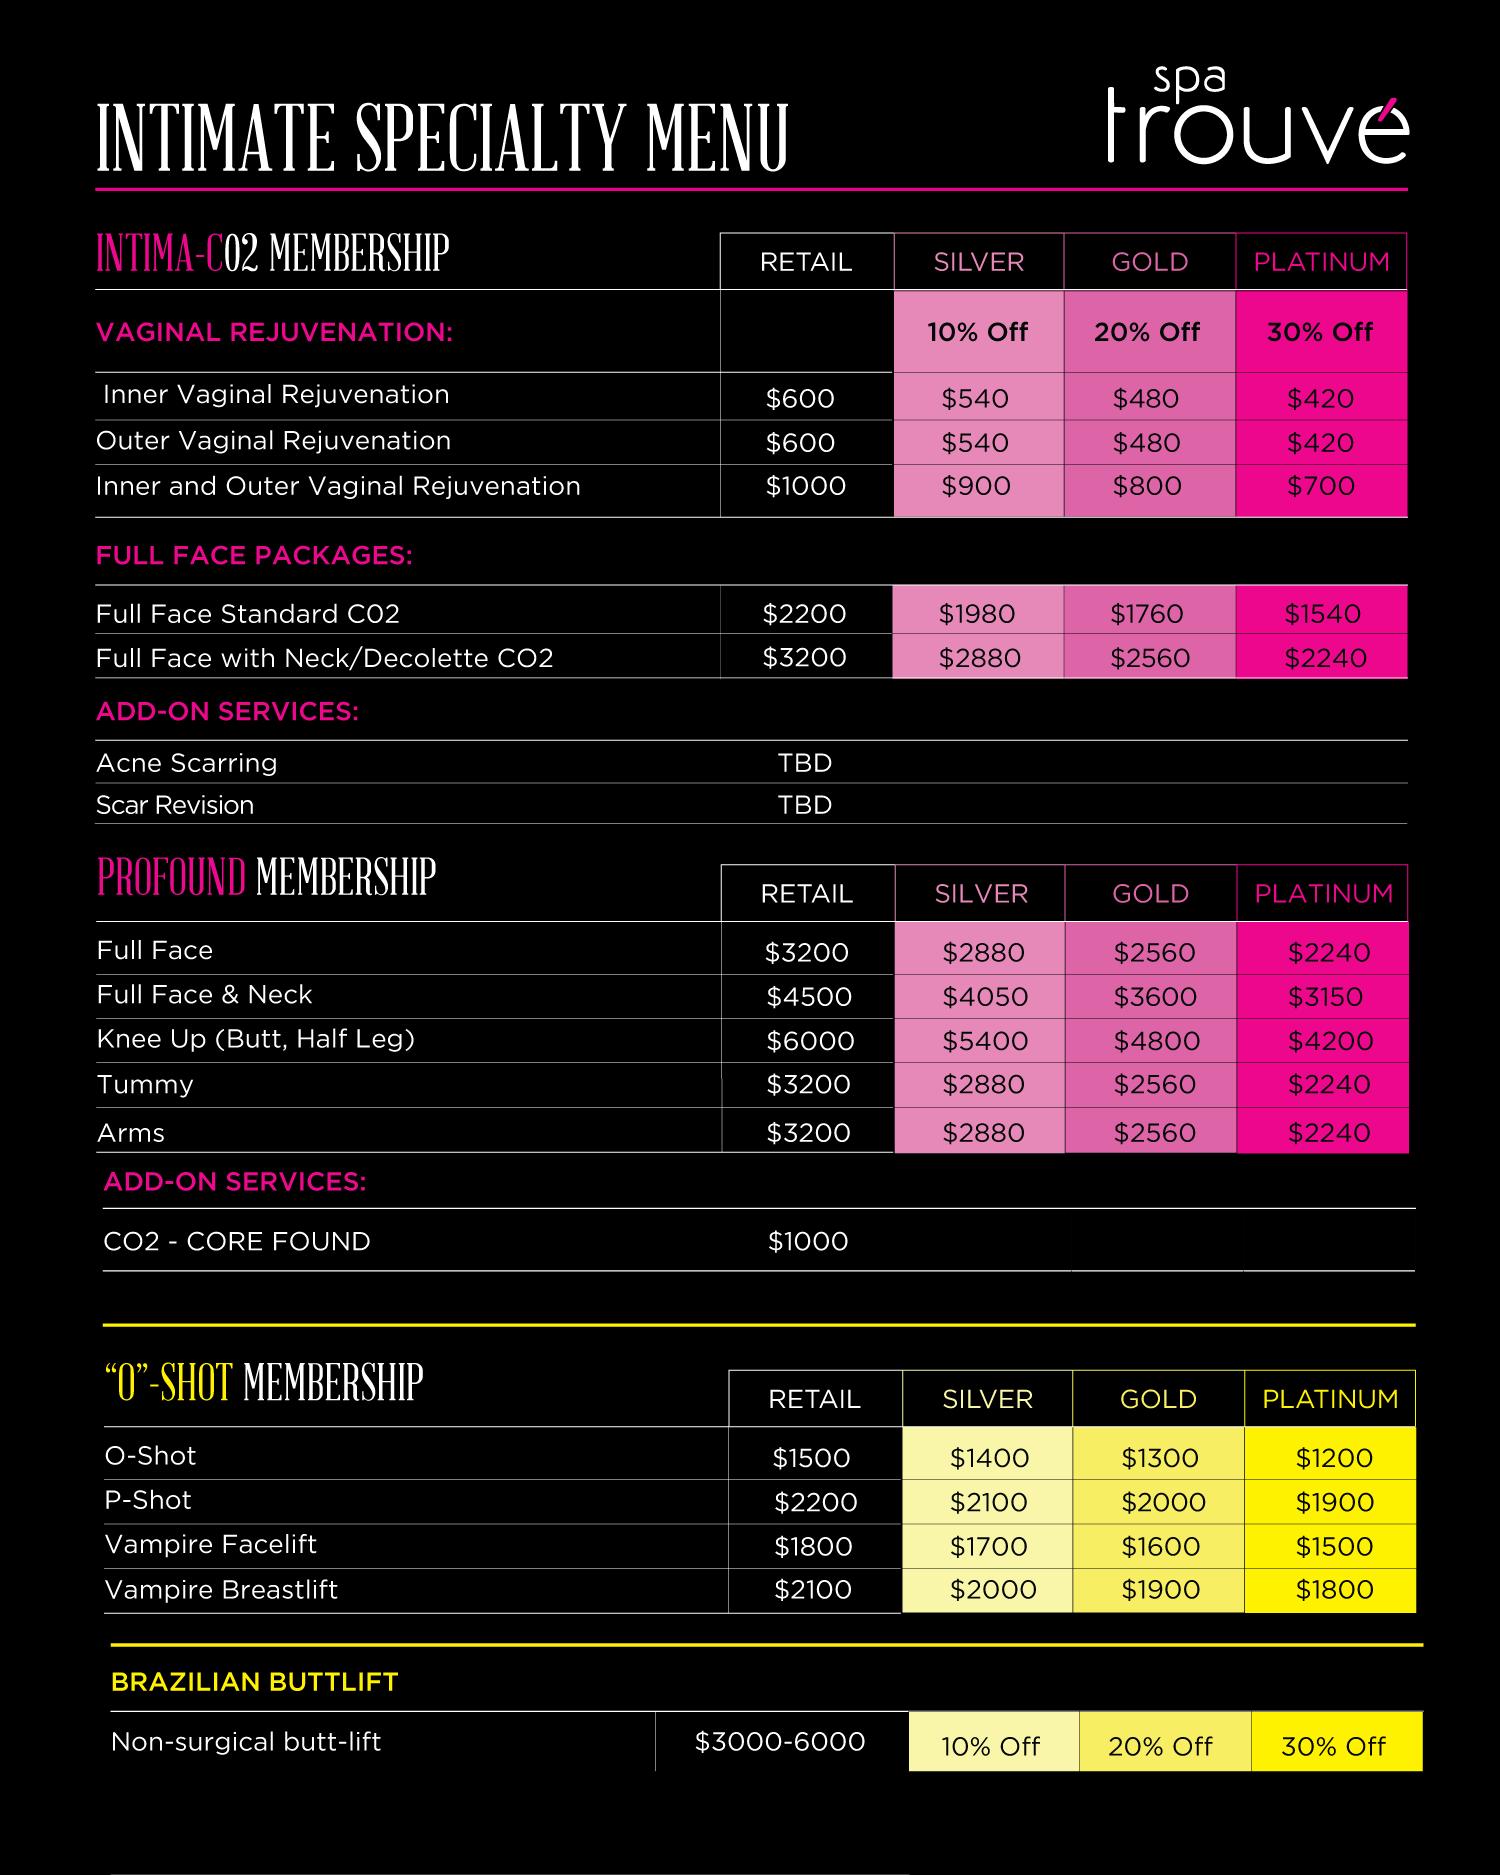 prices and o-shot menu